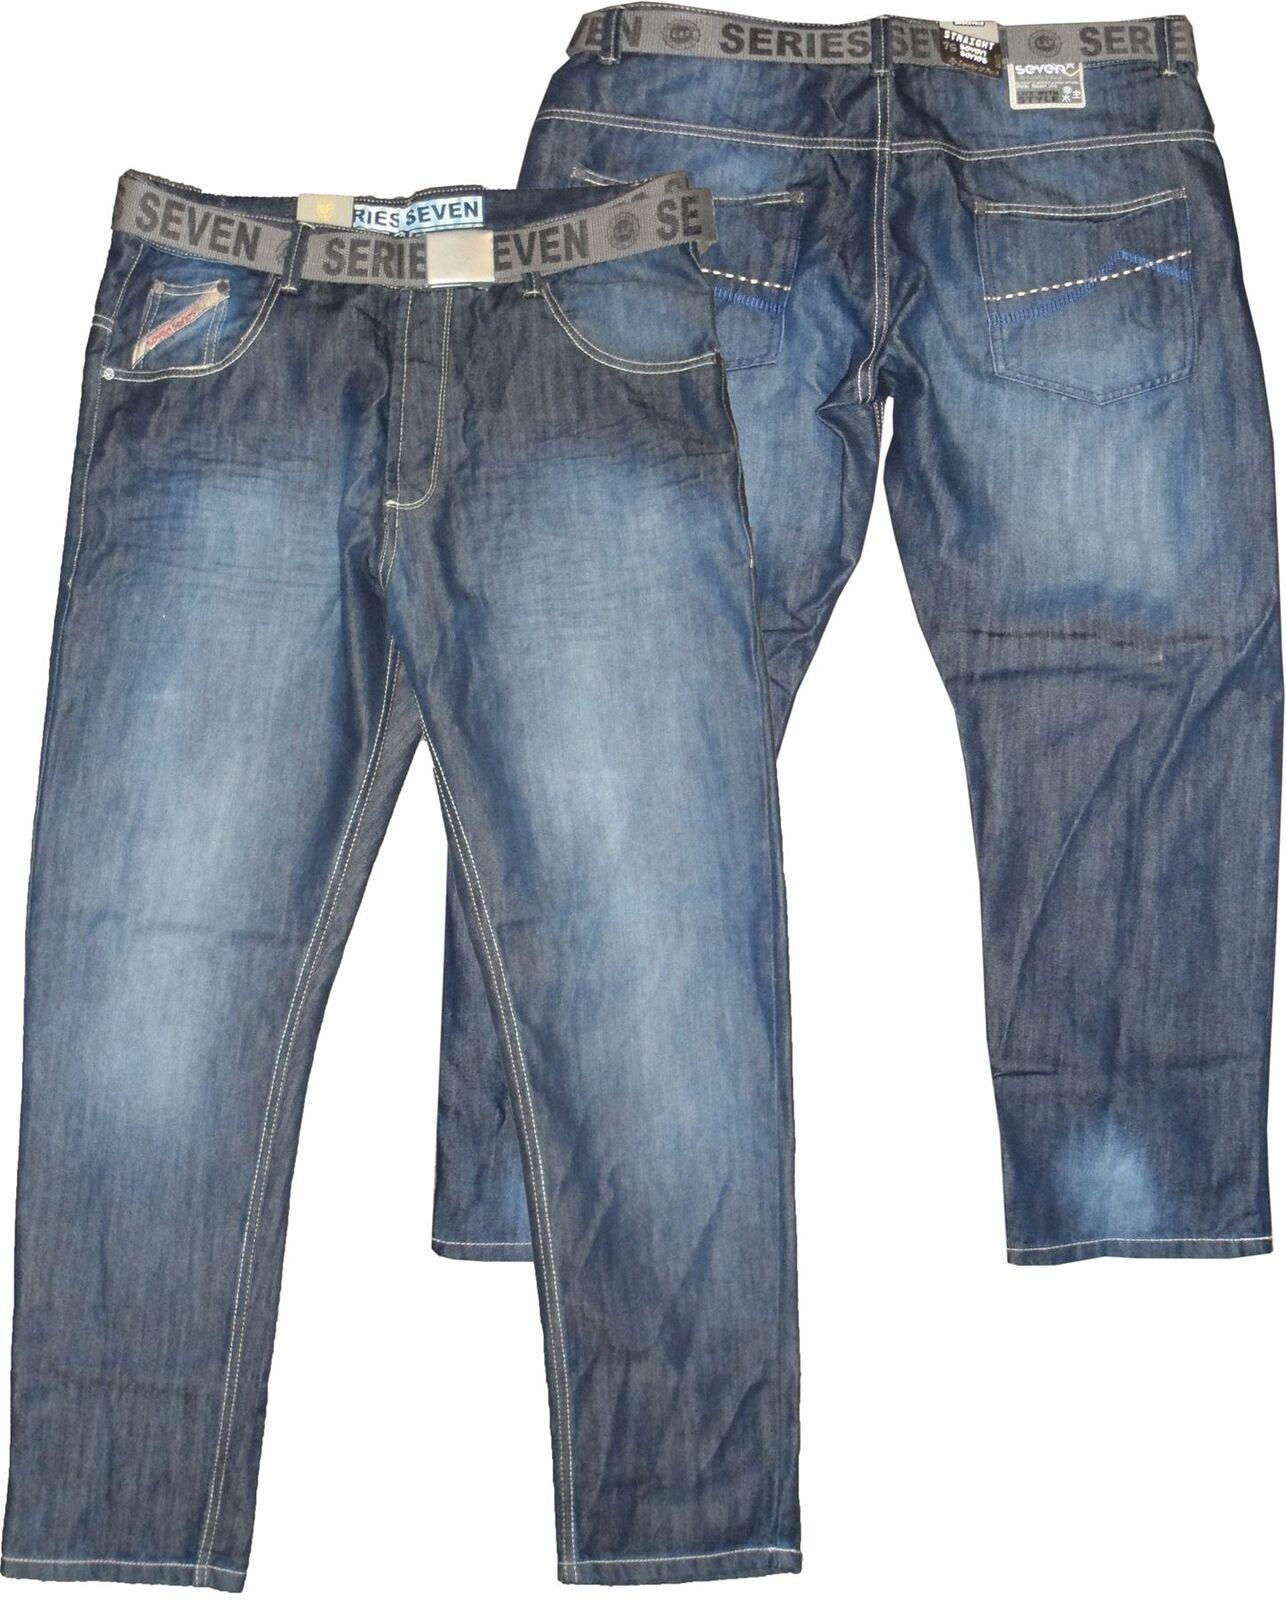 MENS SEVEN SERIES STRAIGHT LEG DARK STONE BELTED JEANS,WAIST 40-56